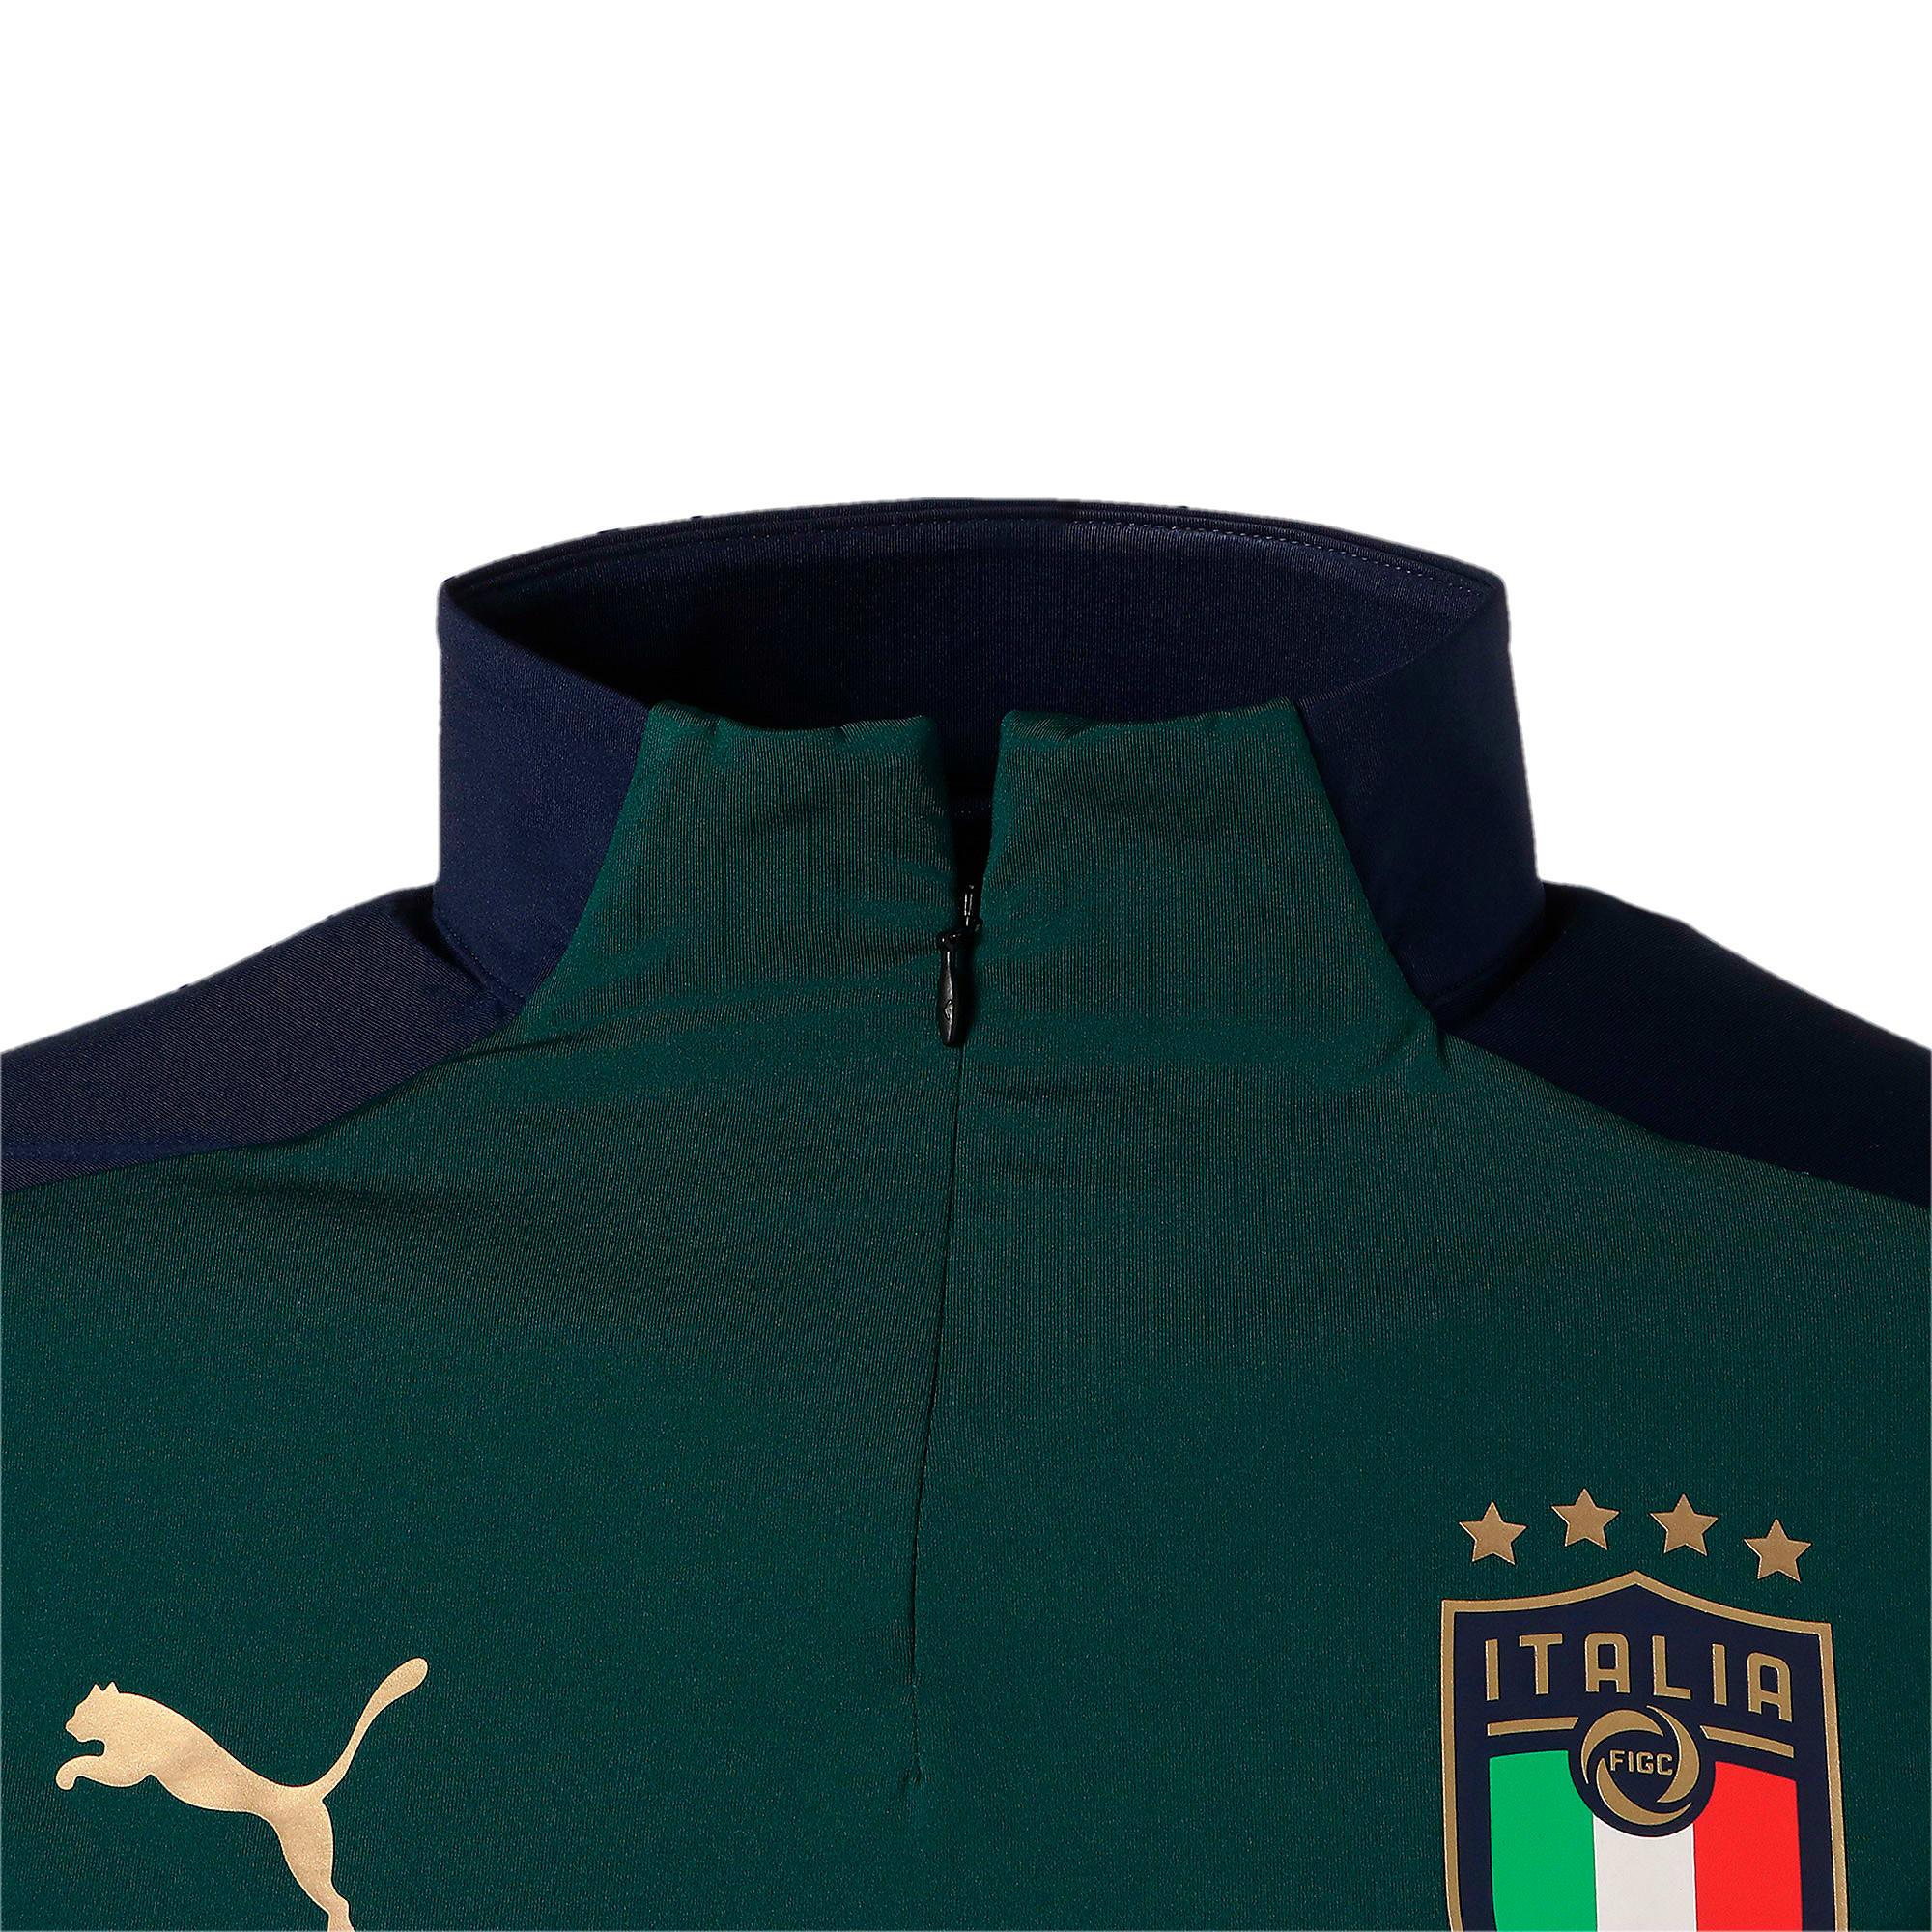 Thumbnail 7 of FIGC イタリア トレーニング 1/4 ジップトップ, Ponderosa Pine-Peacoat, medium-JPN